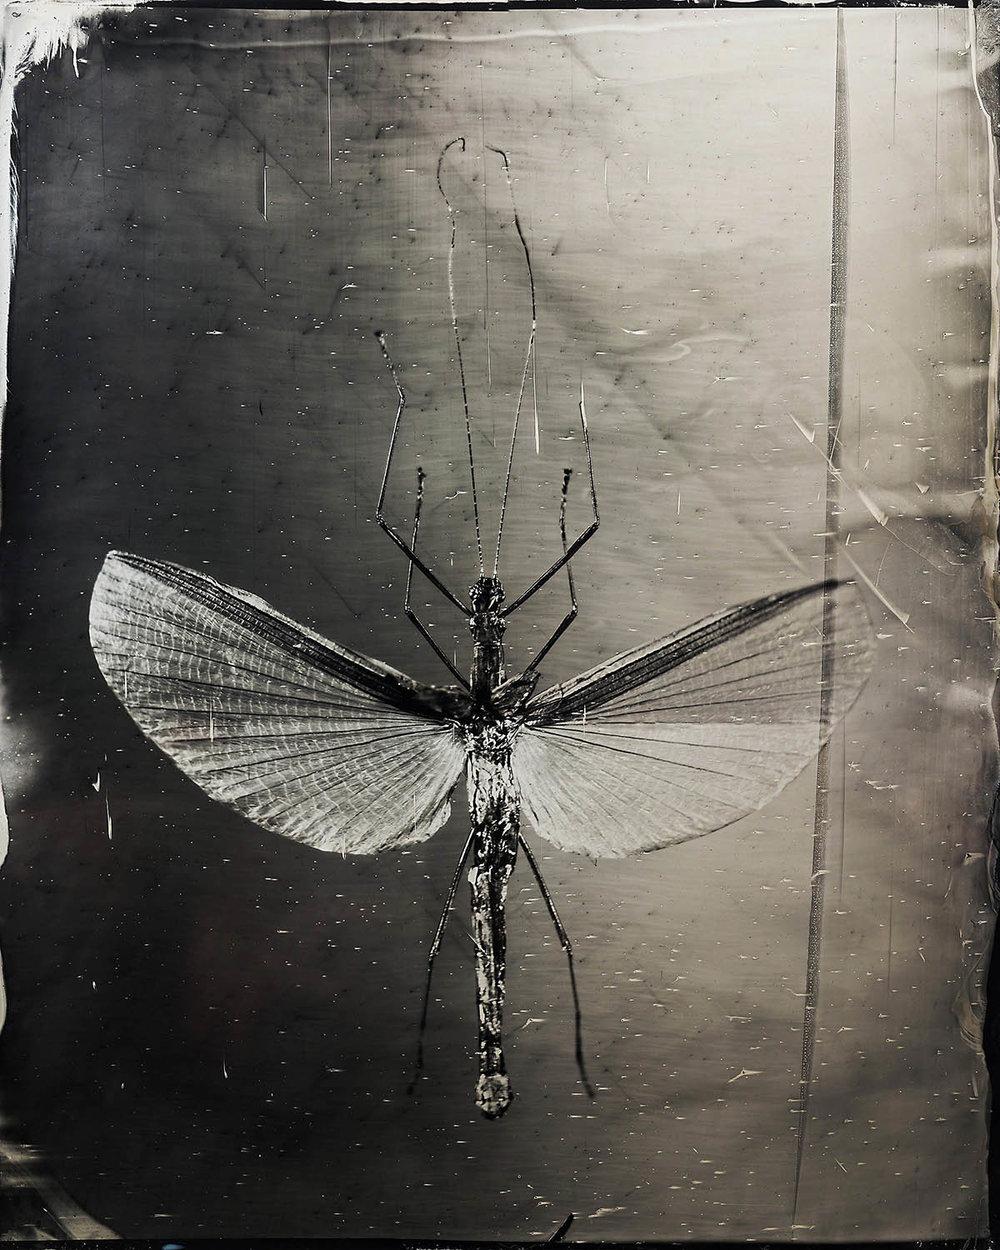 The Katydid - By:Maximilian Zeitler  www.maximilianzeitler.com